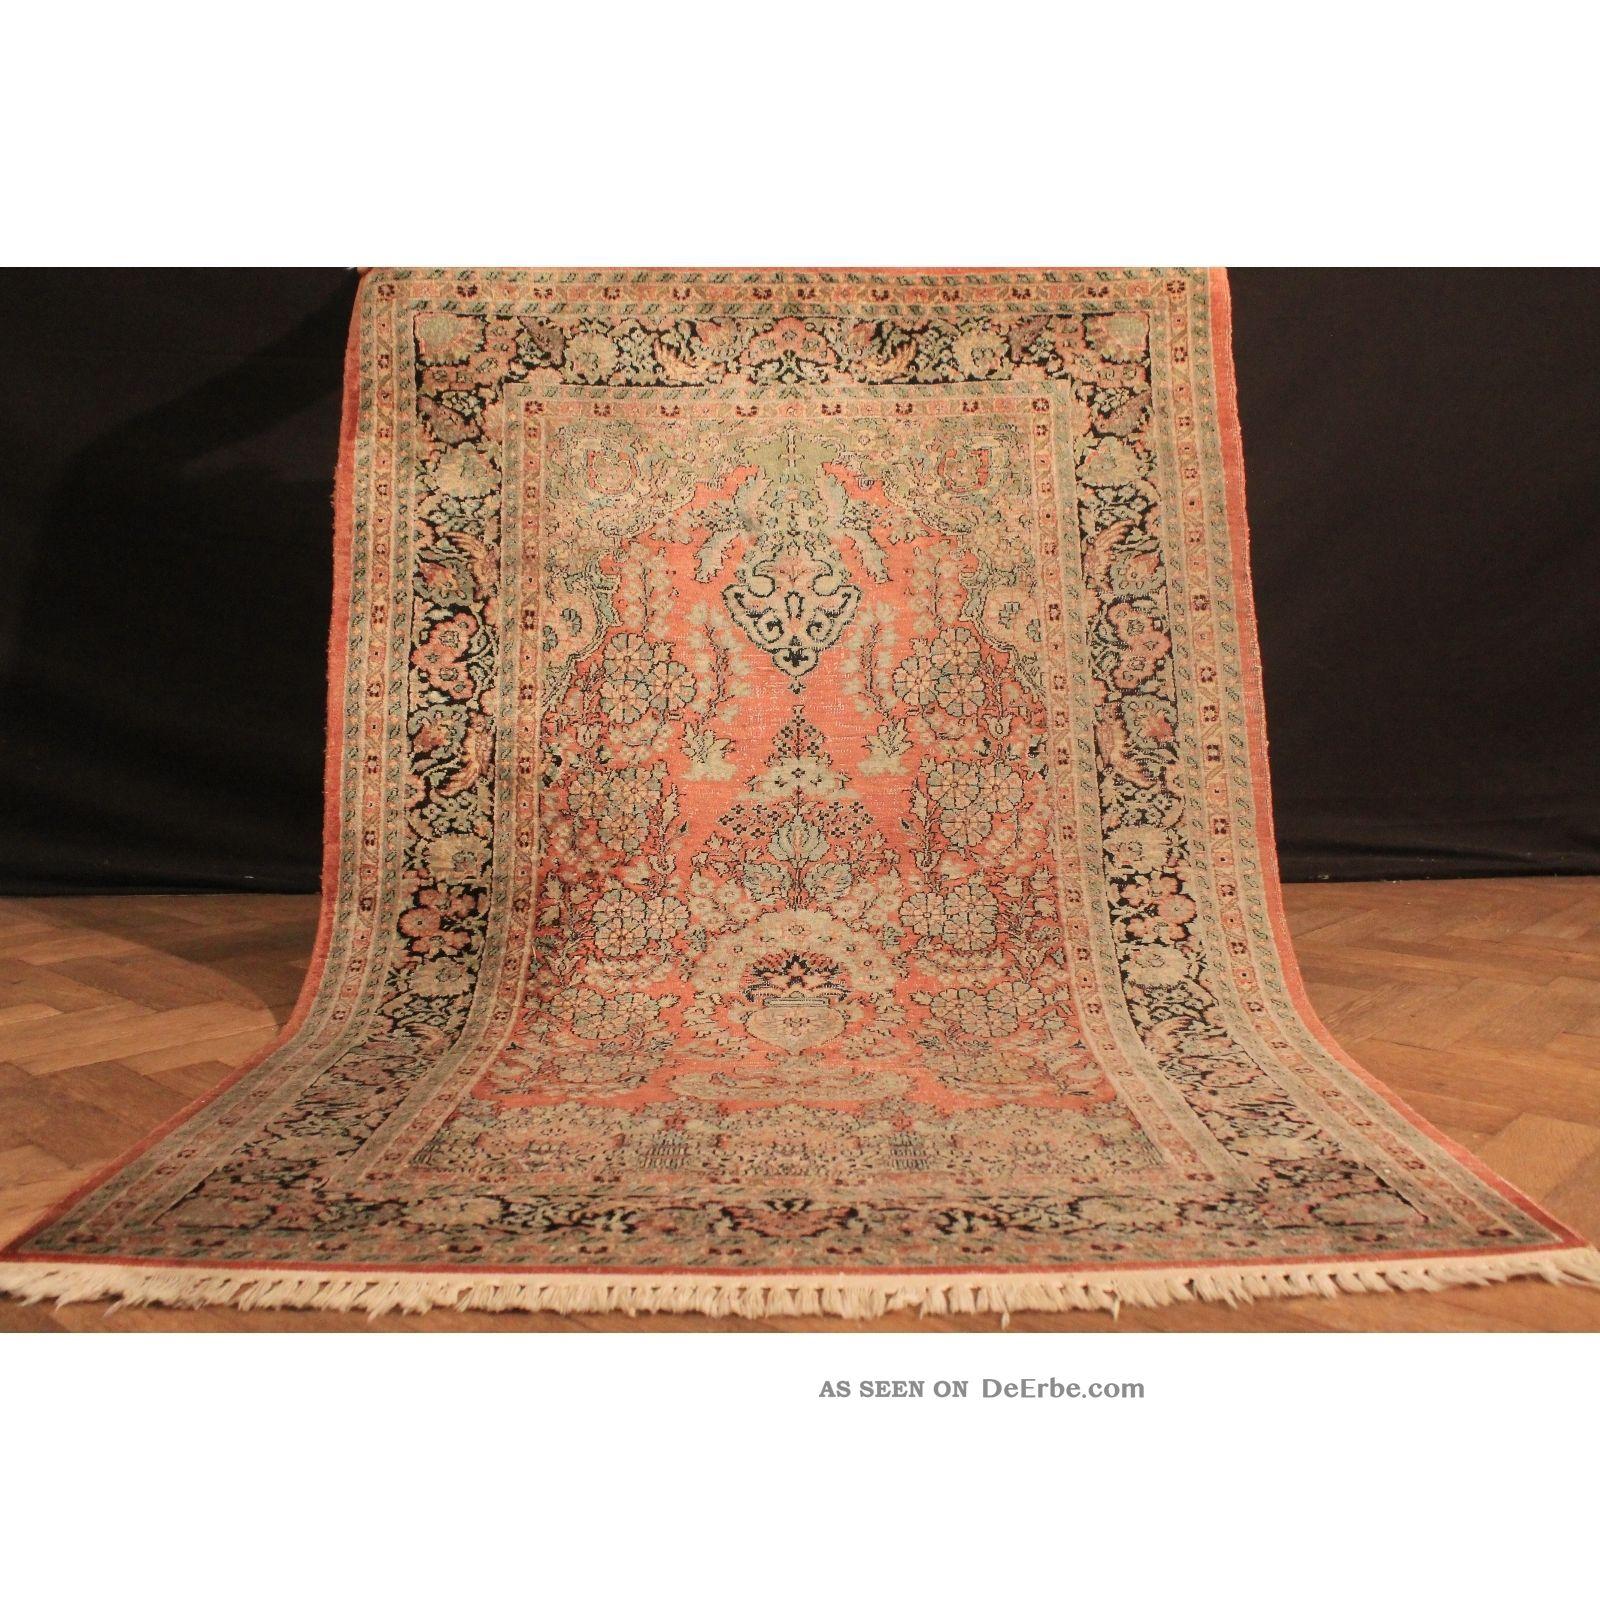 Wertvoll Handgeknüpft Kashmir Perser Seiden Teppich Lebensbaum Carpet 180x125 Teppiche & Flachgewebe Bild